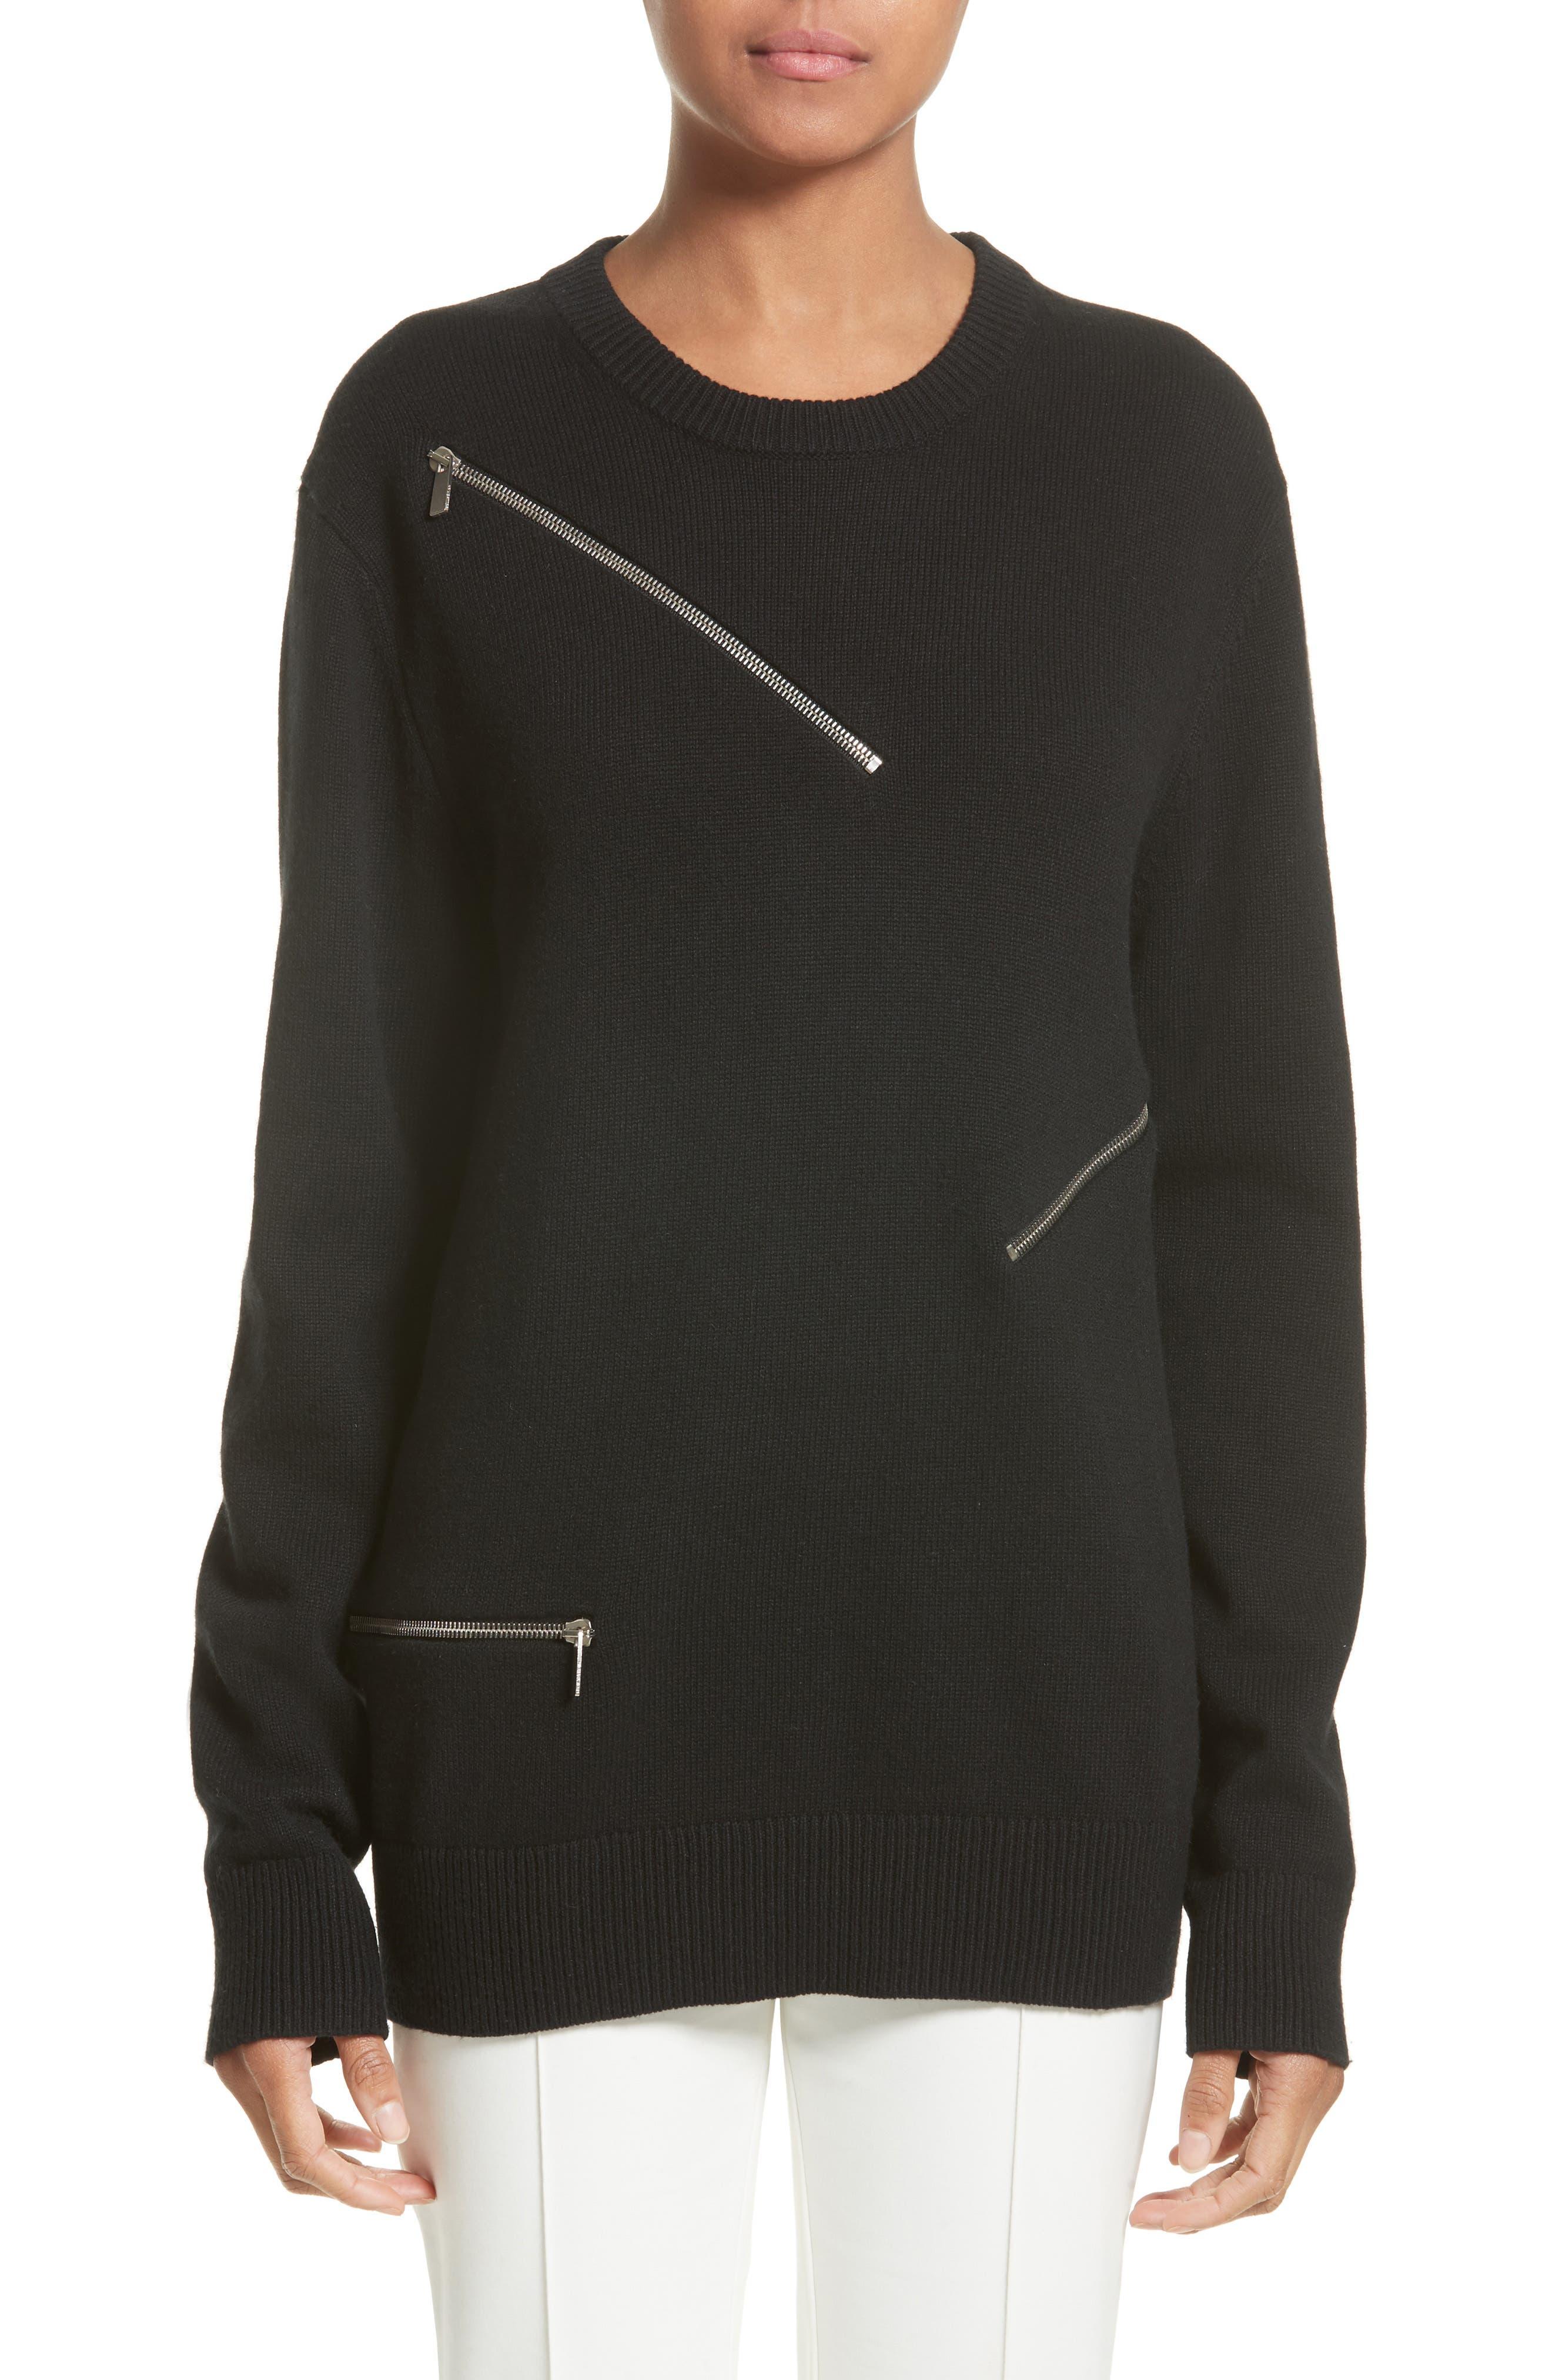 Main Image - Michael Kors Zip Detail Cashmere & Cotton Sweater